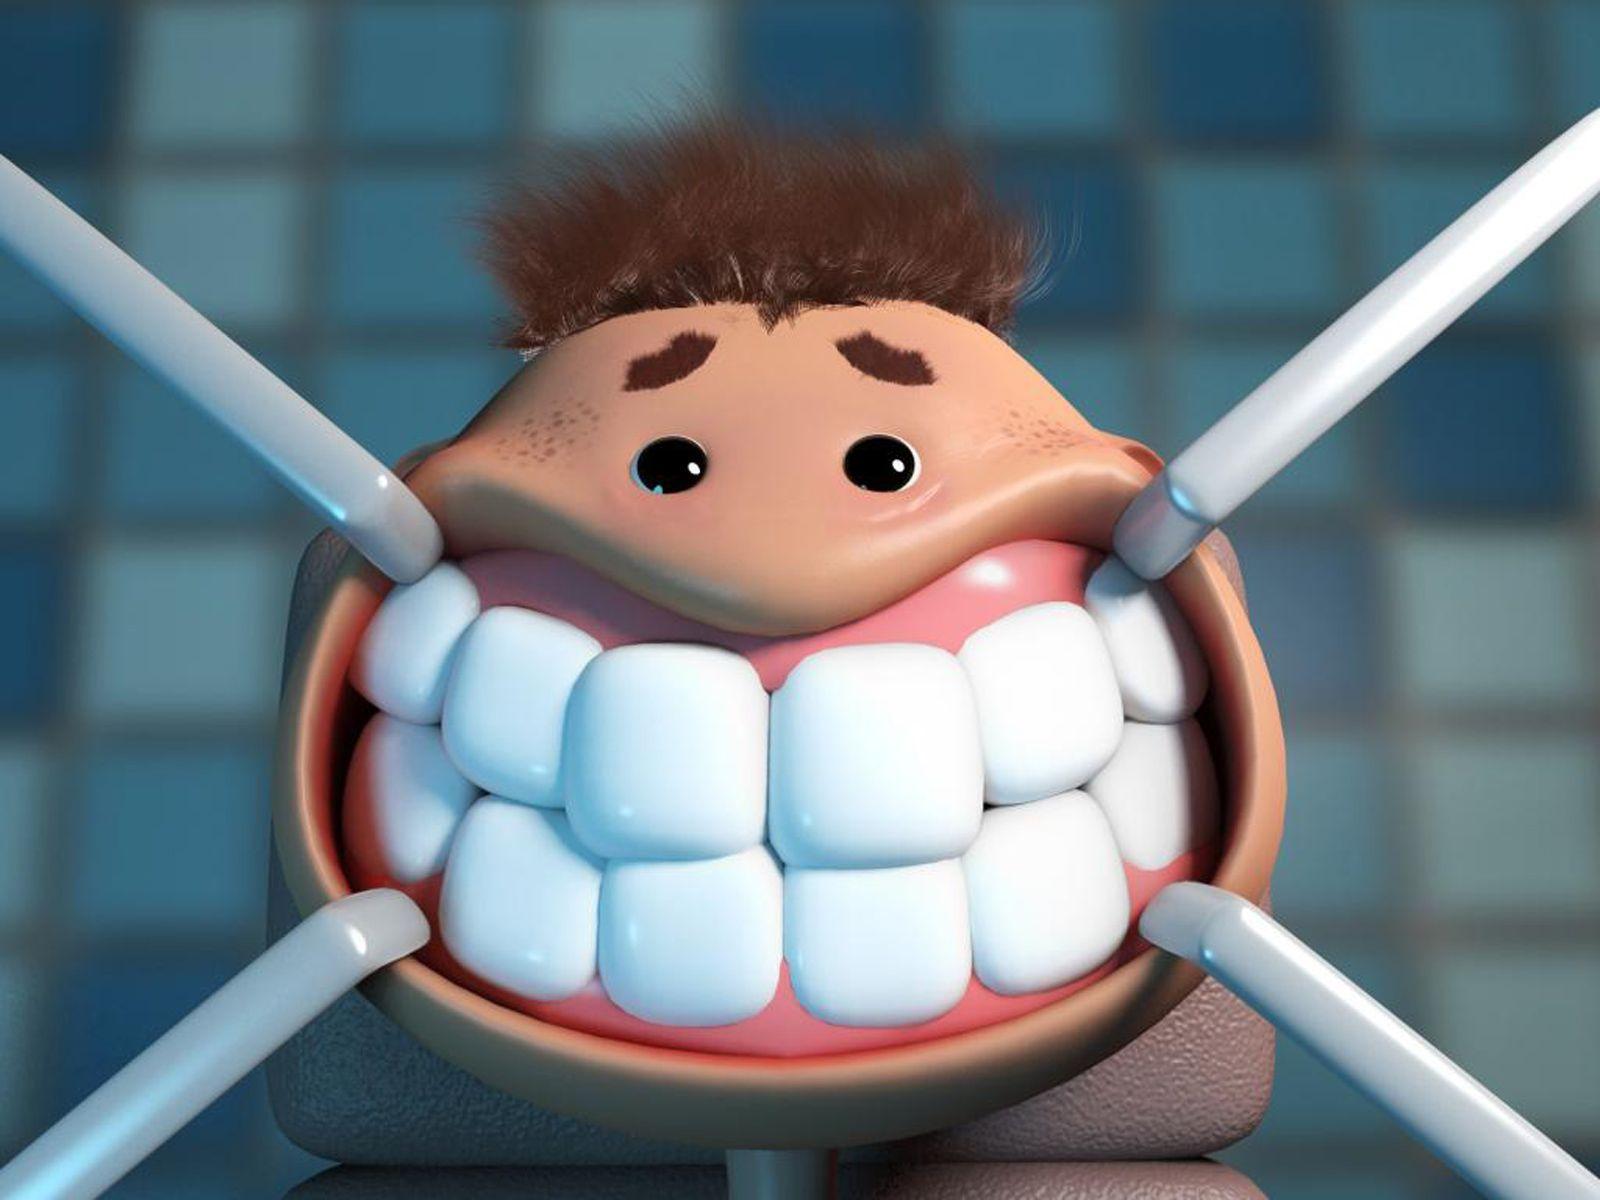 Tooth Desktop Wallpaper Free